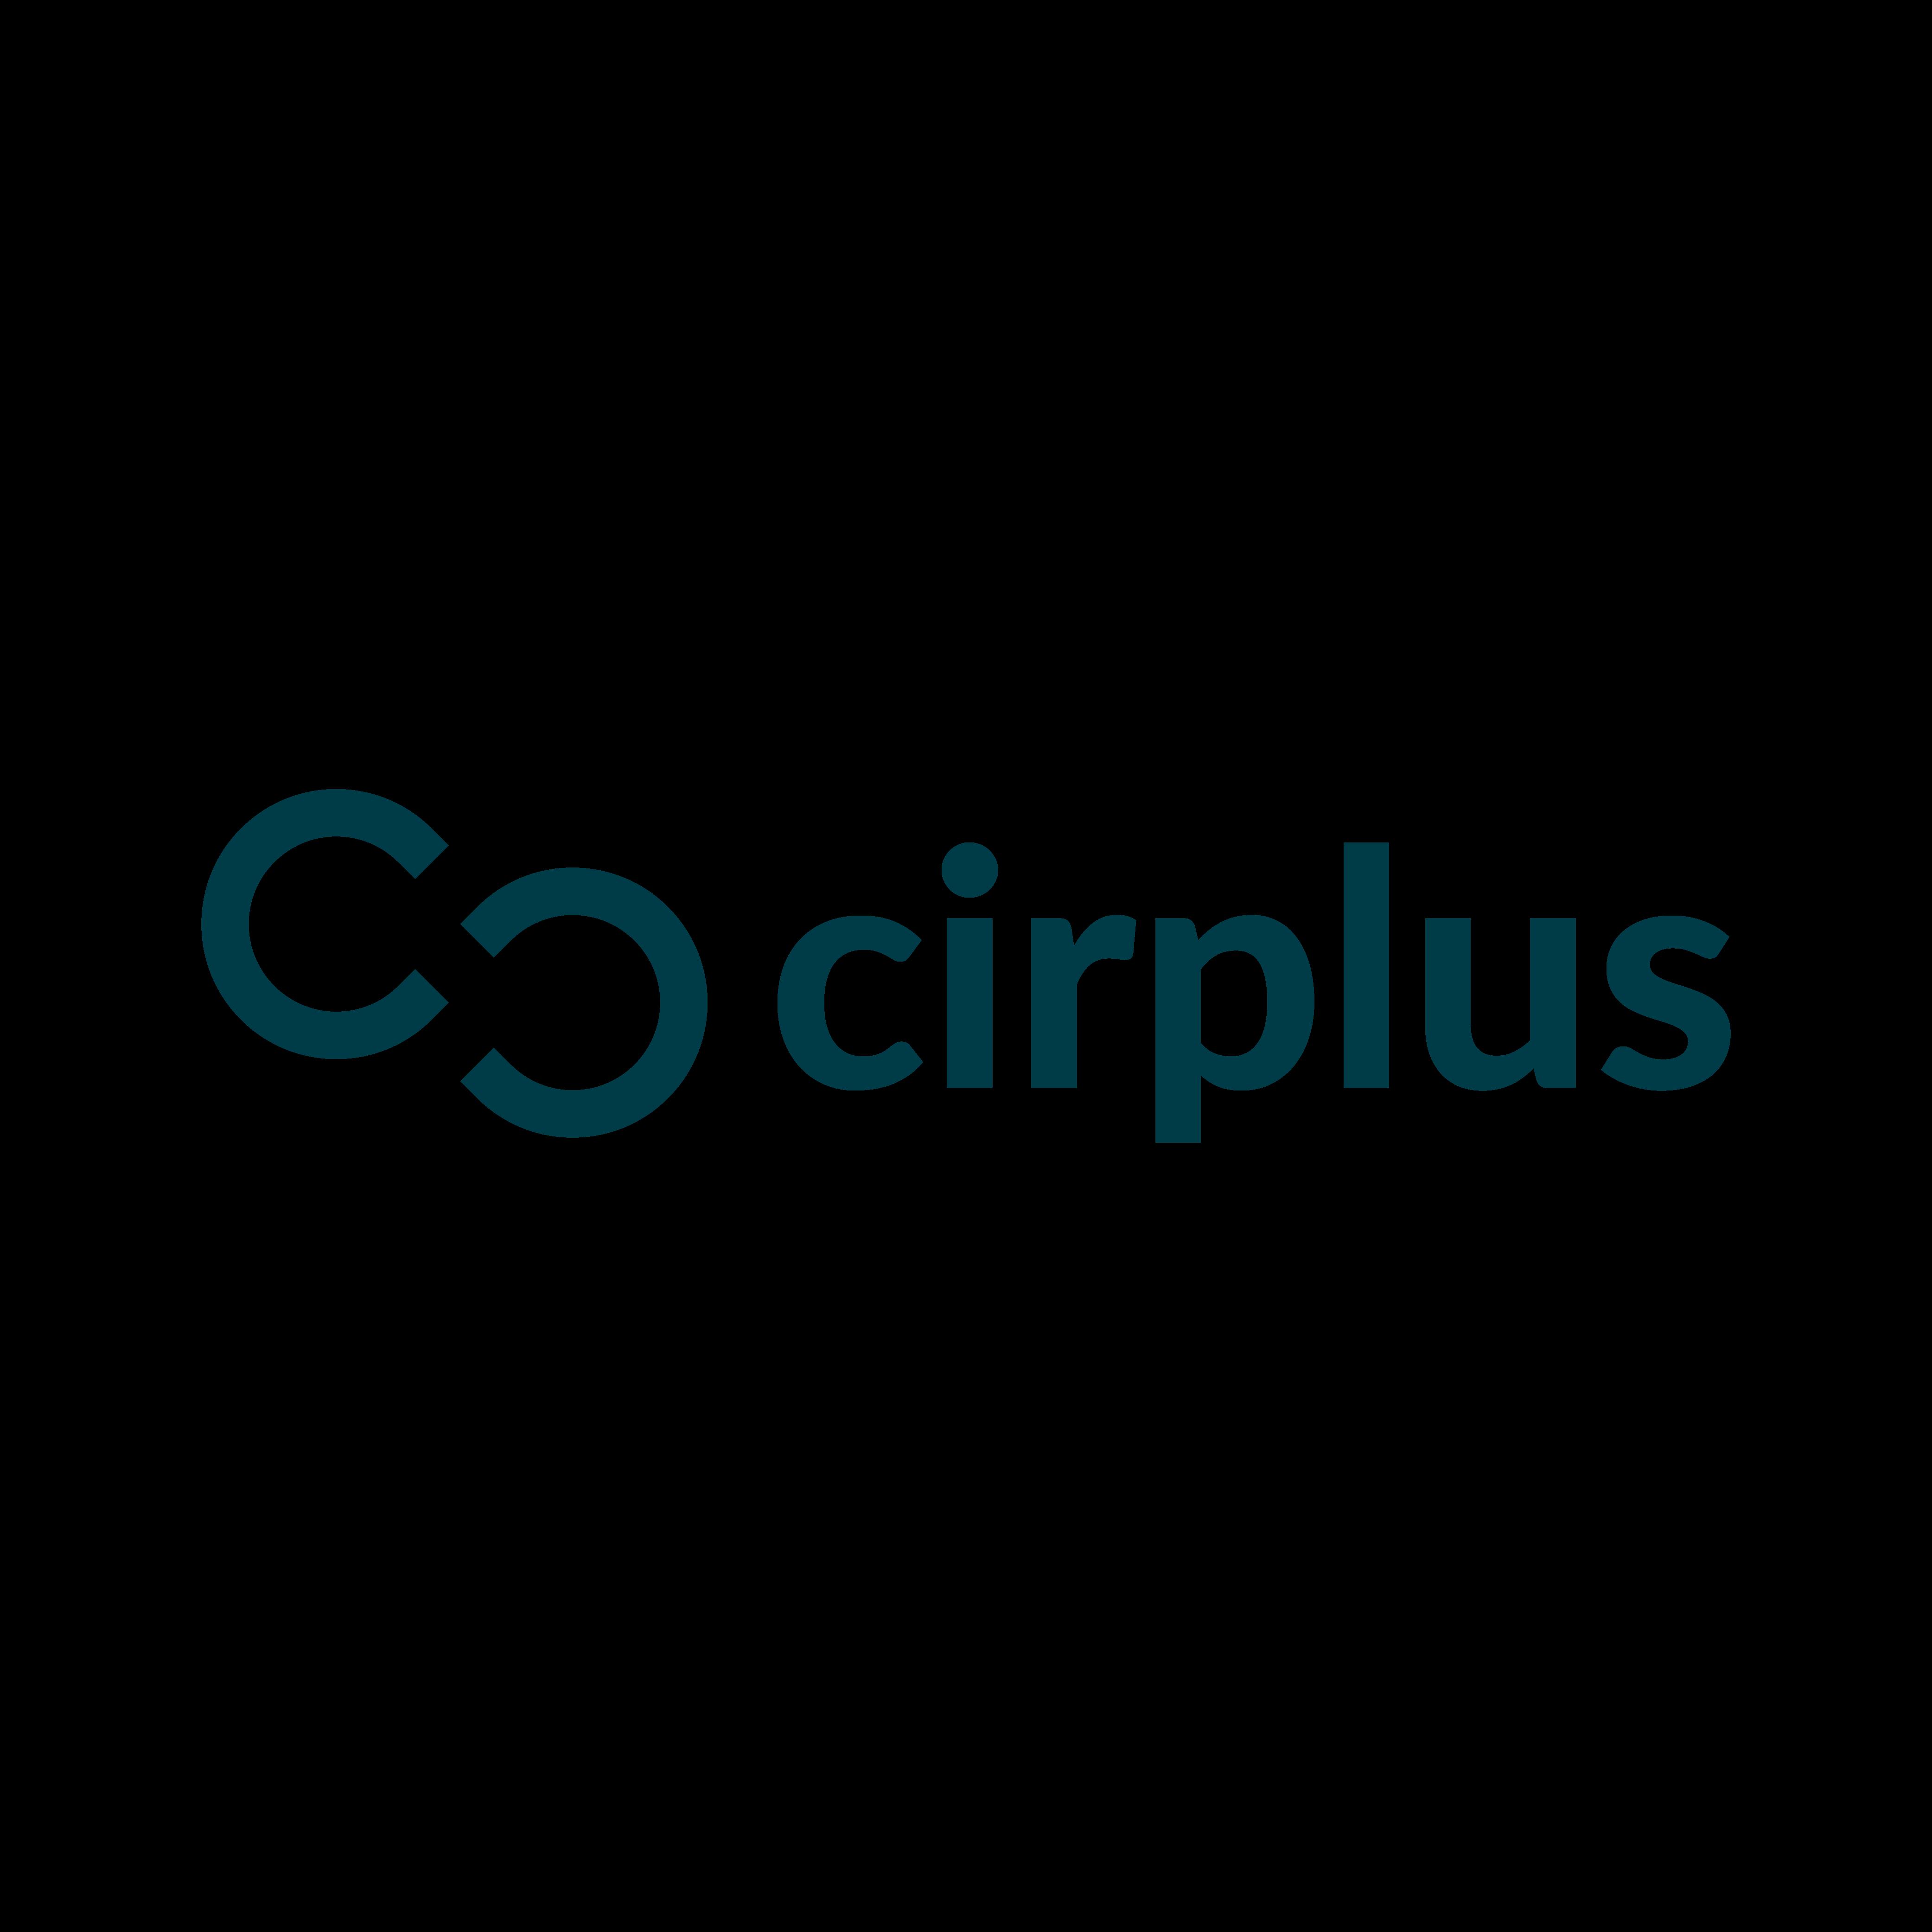 https://europeanplasticspact.org/wp-content/uploads/2020/03/cirplus-GmbH.png